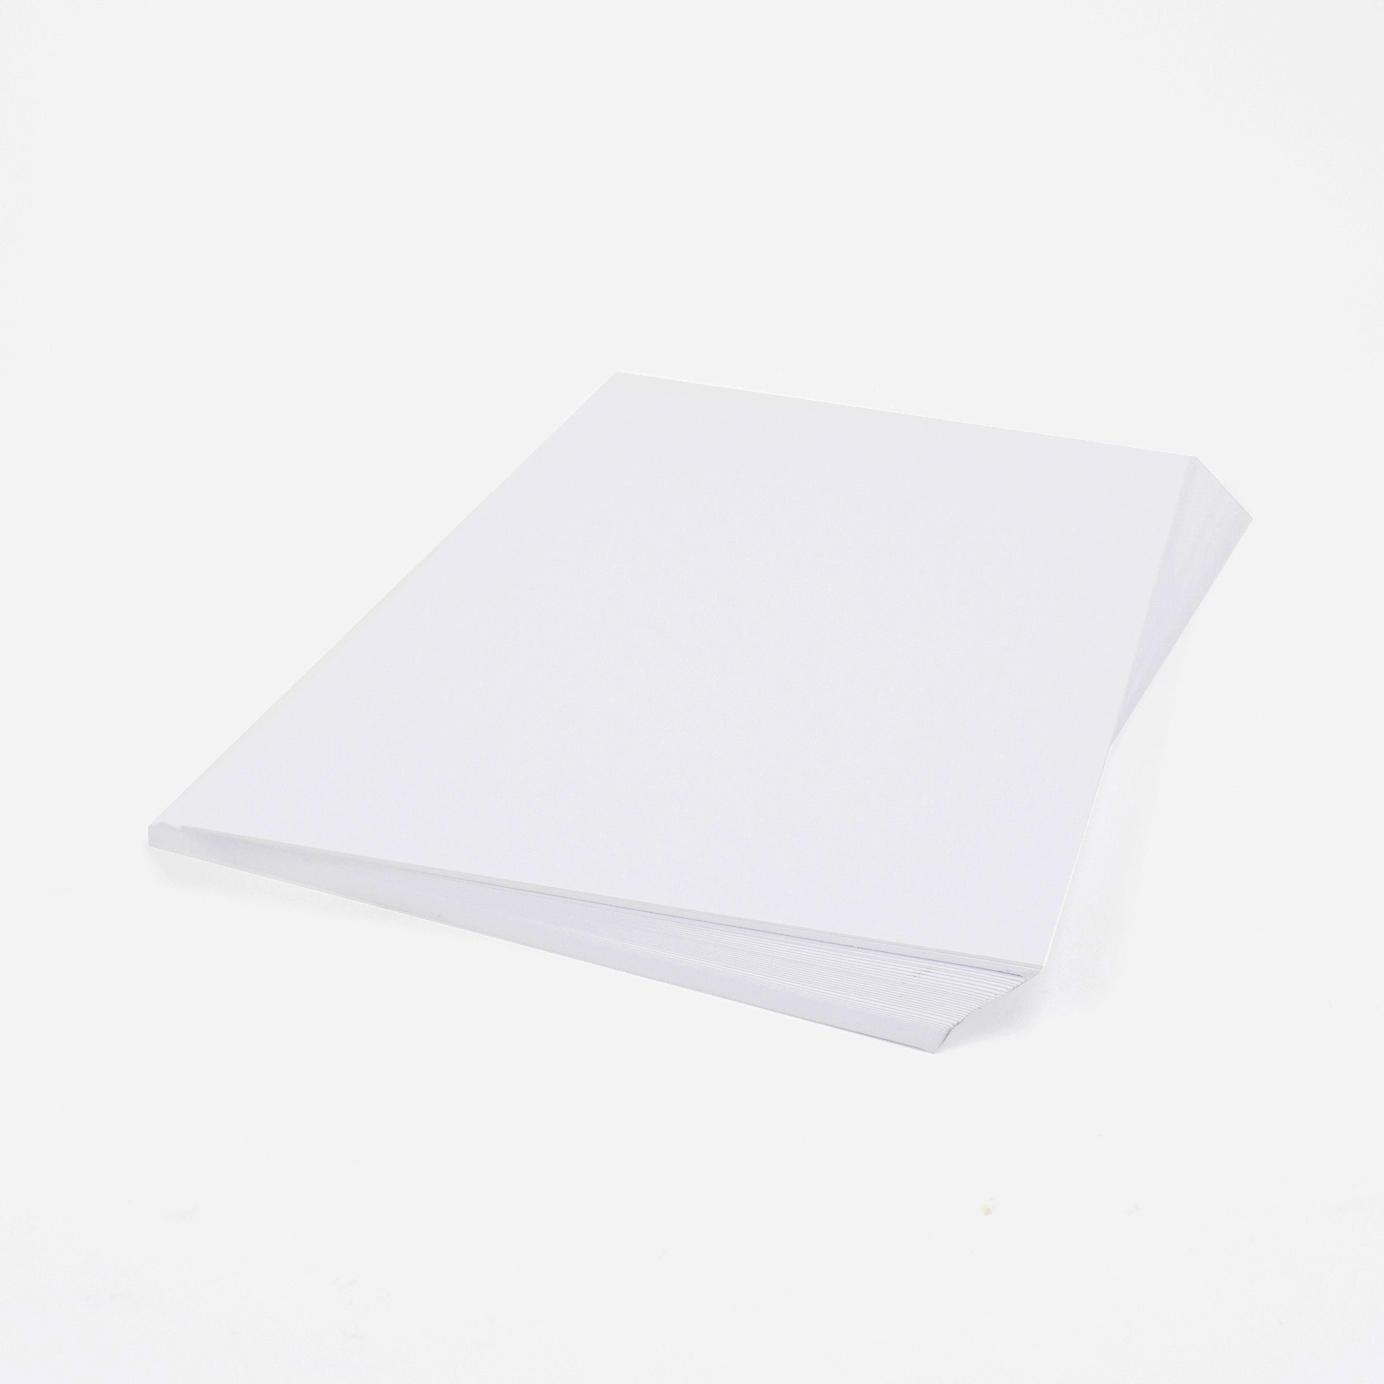 5 Star Elite Photo Inkjet Paper Gloss 280gsm A4 White 50 Sheets